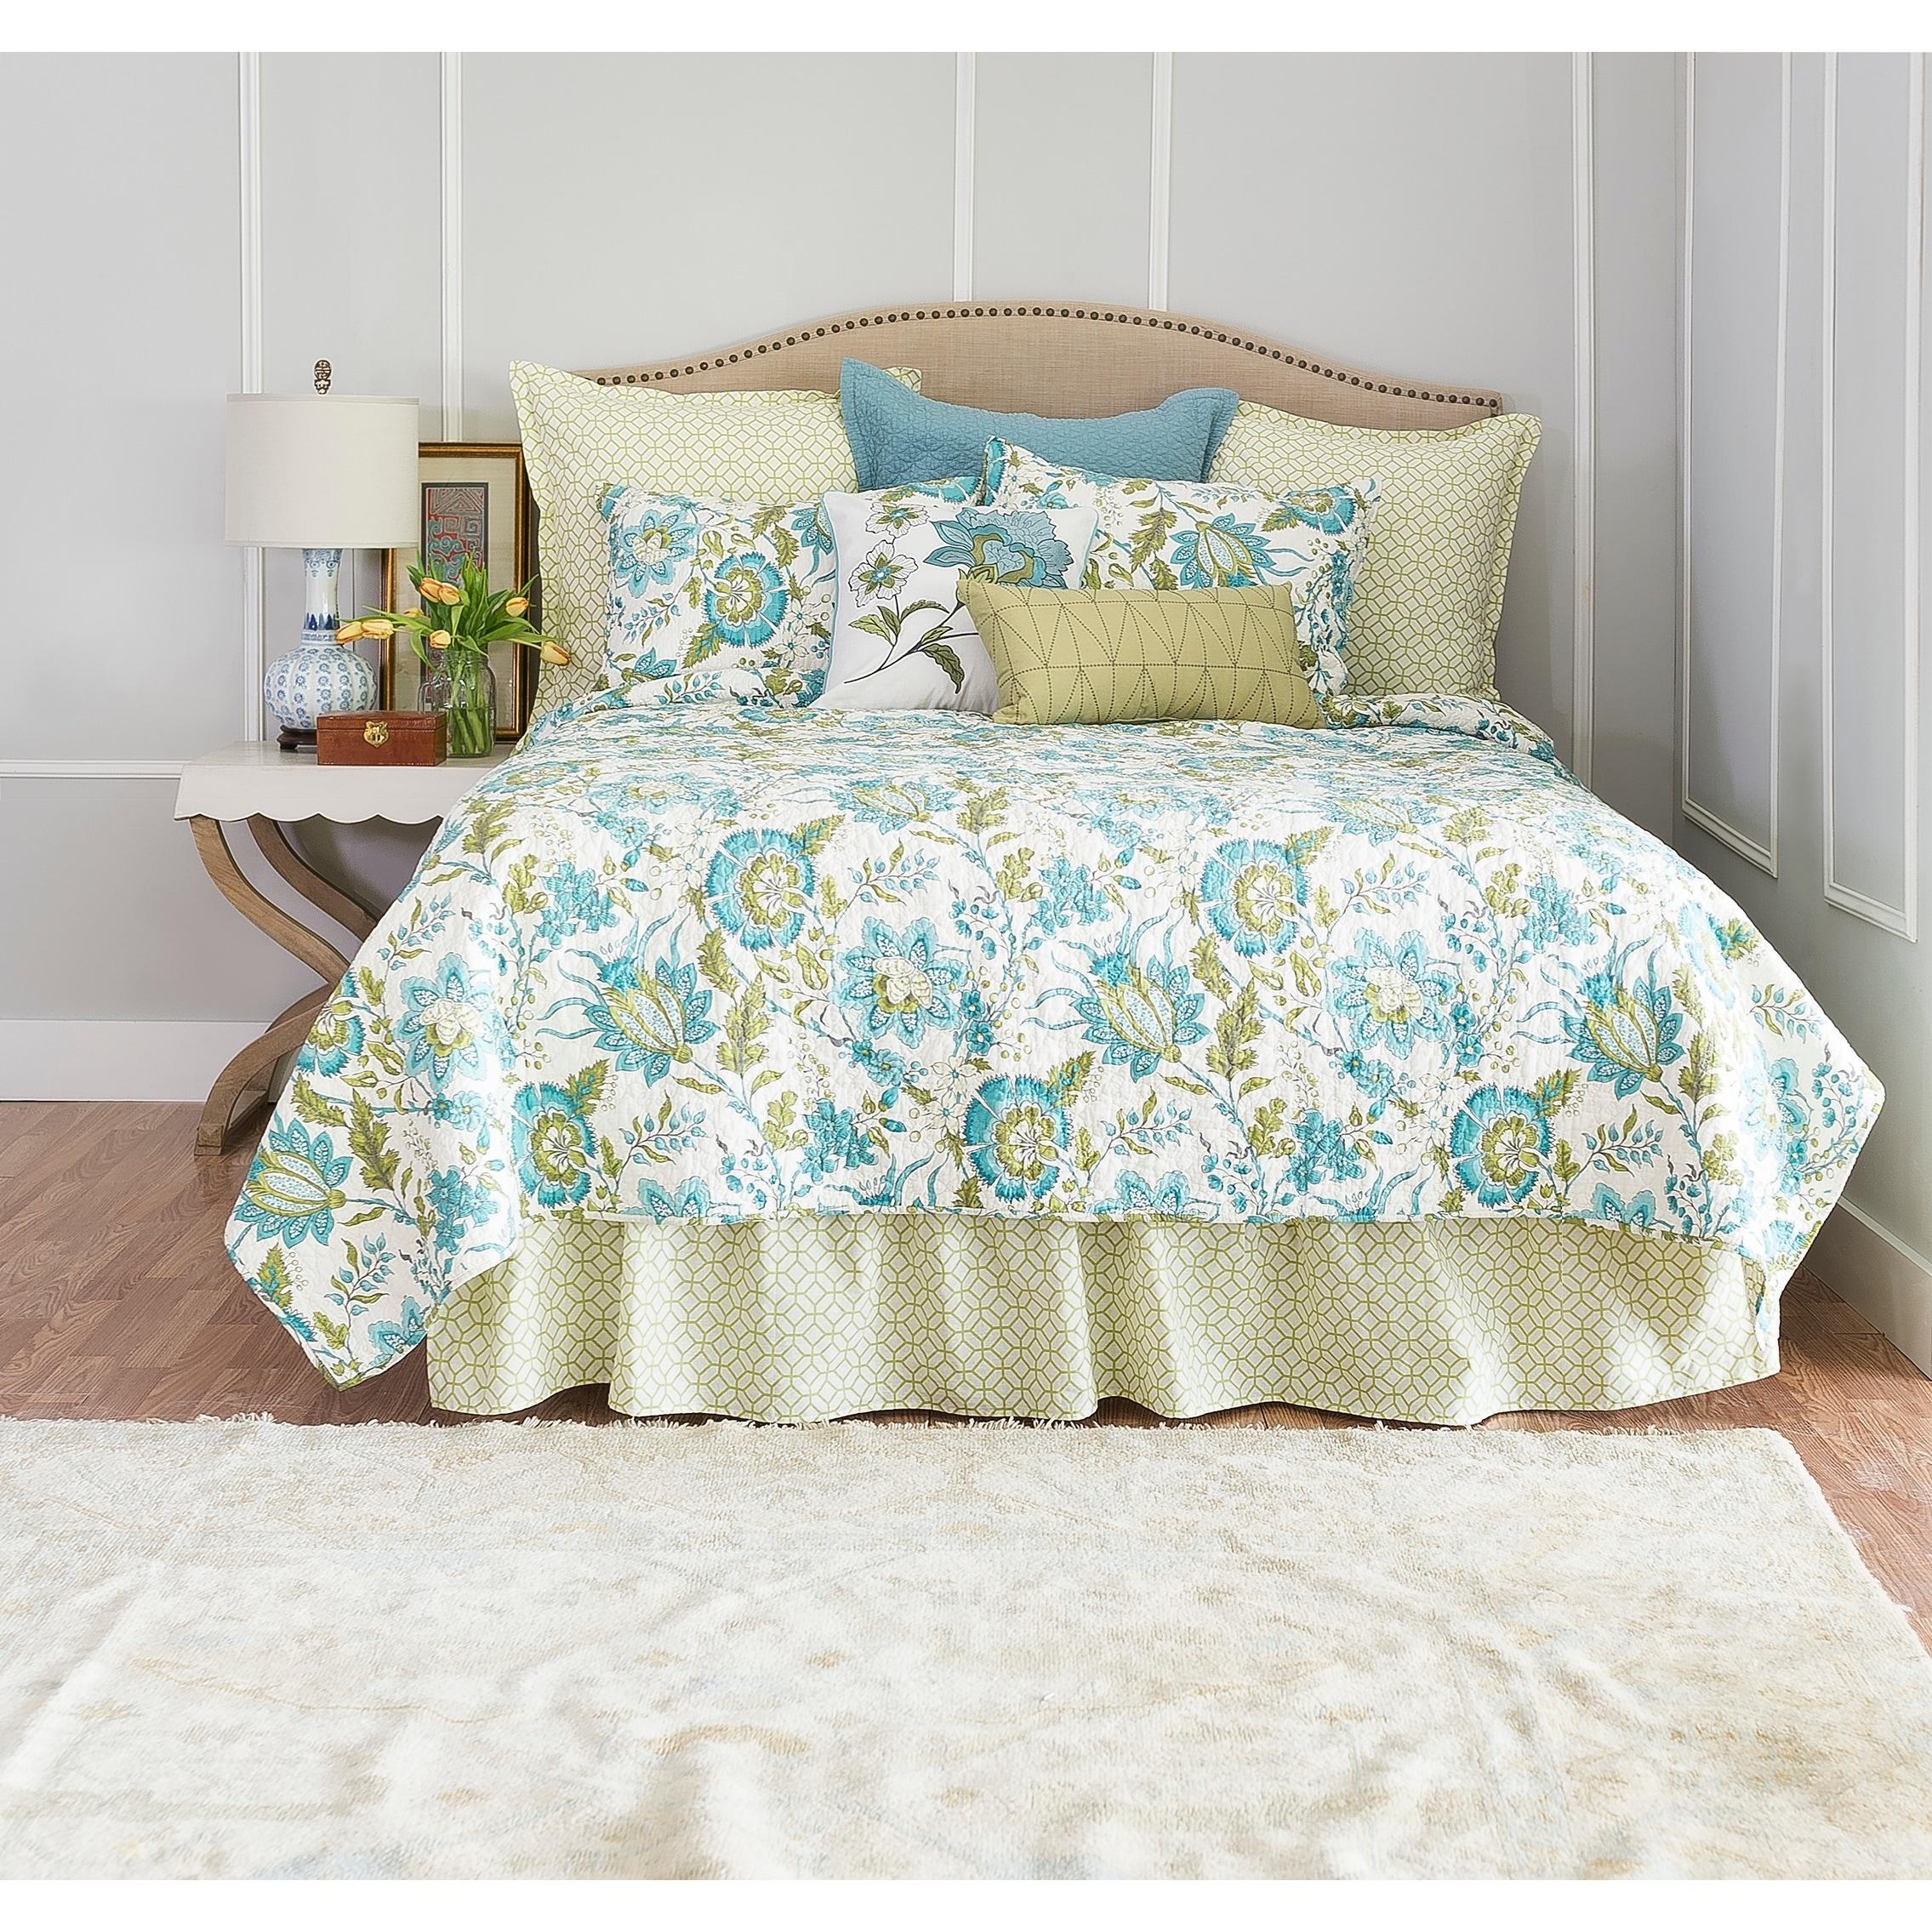 Enterprises Adrienne Meadow Quilt (Shams Not Included) (King), Blue (Cotton, Floral)